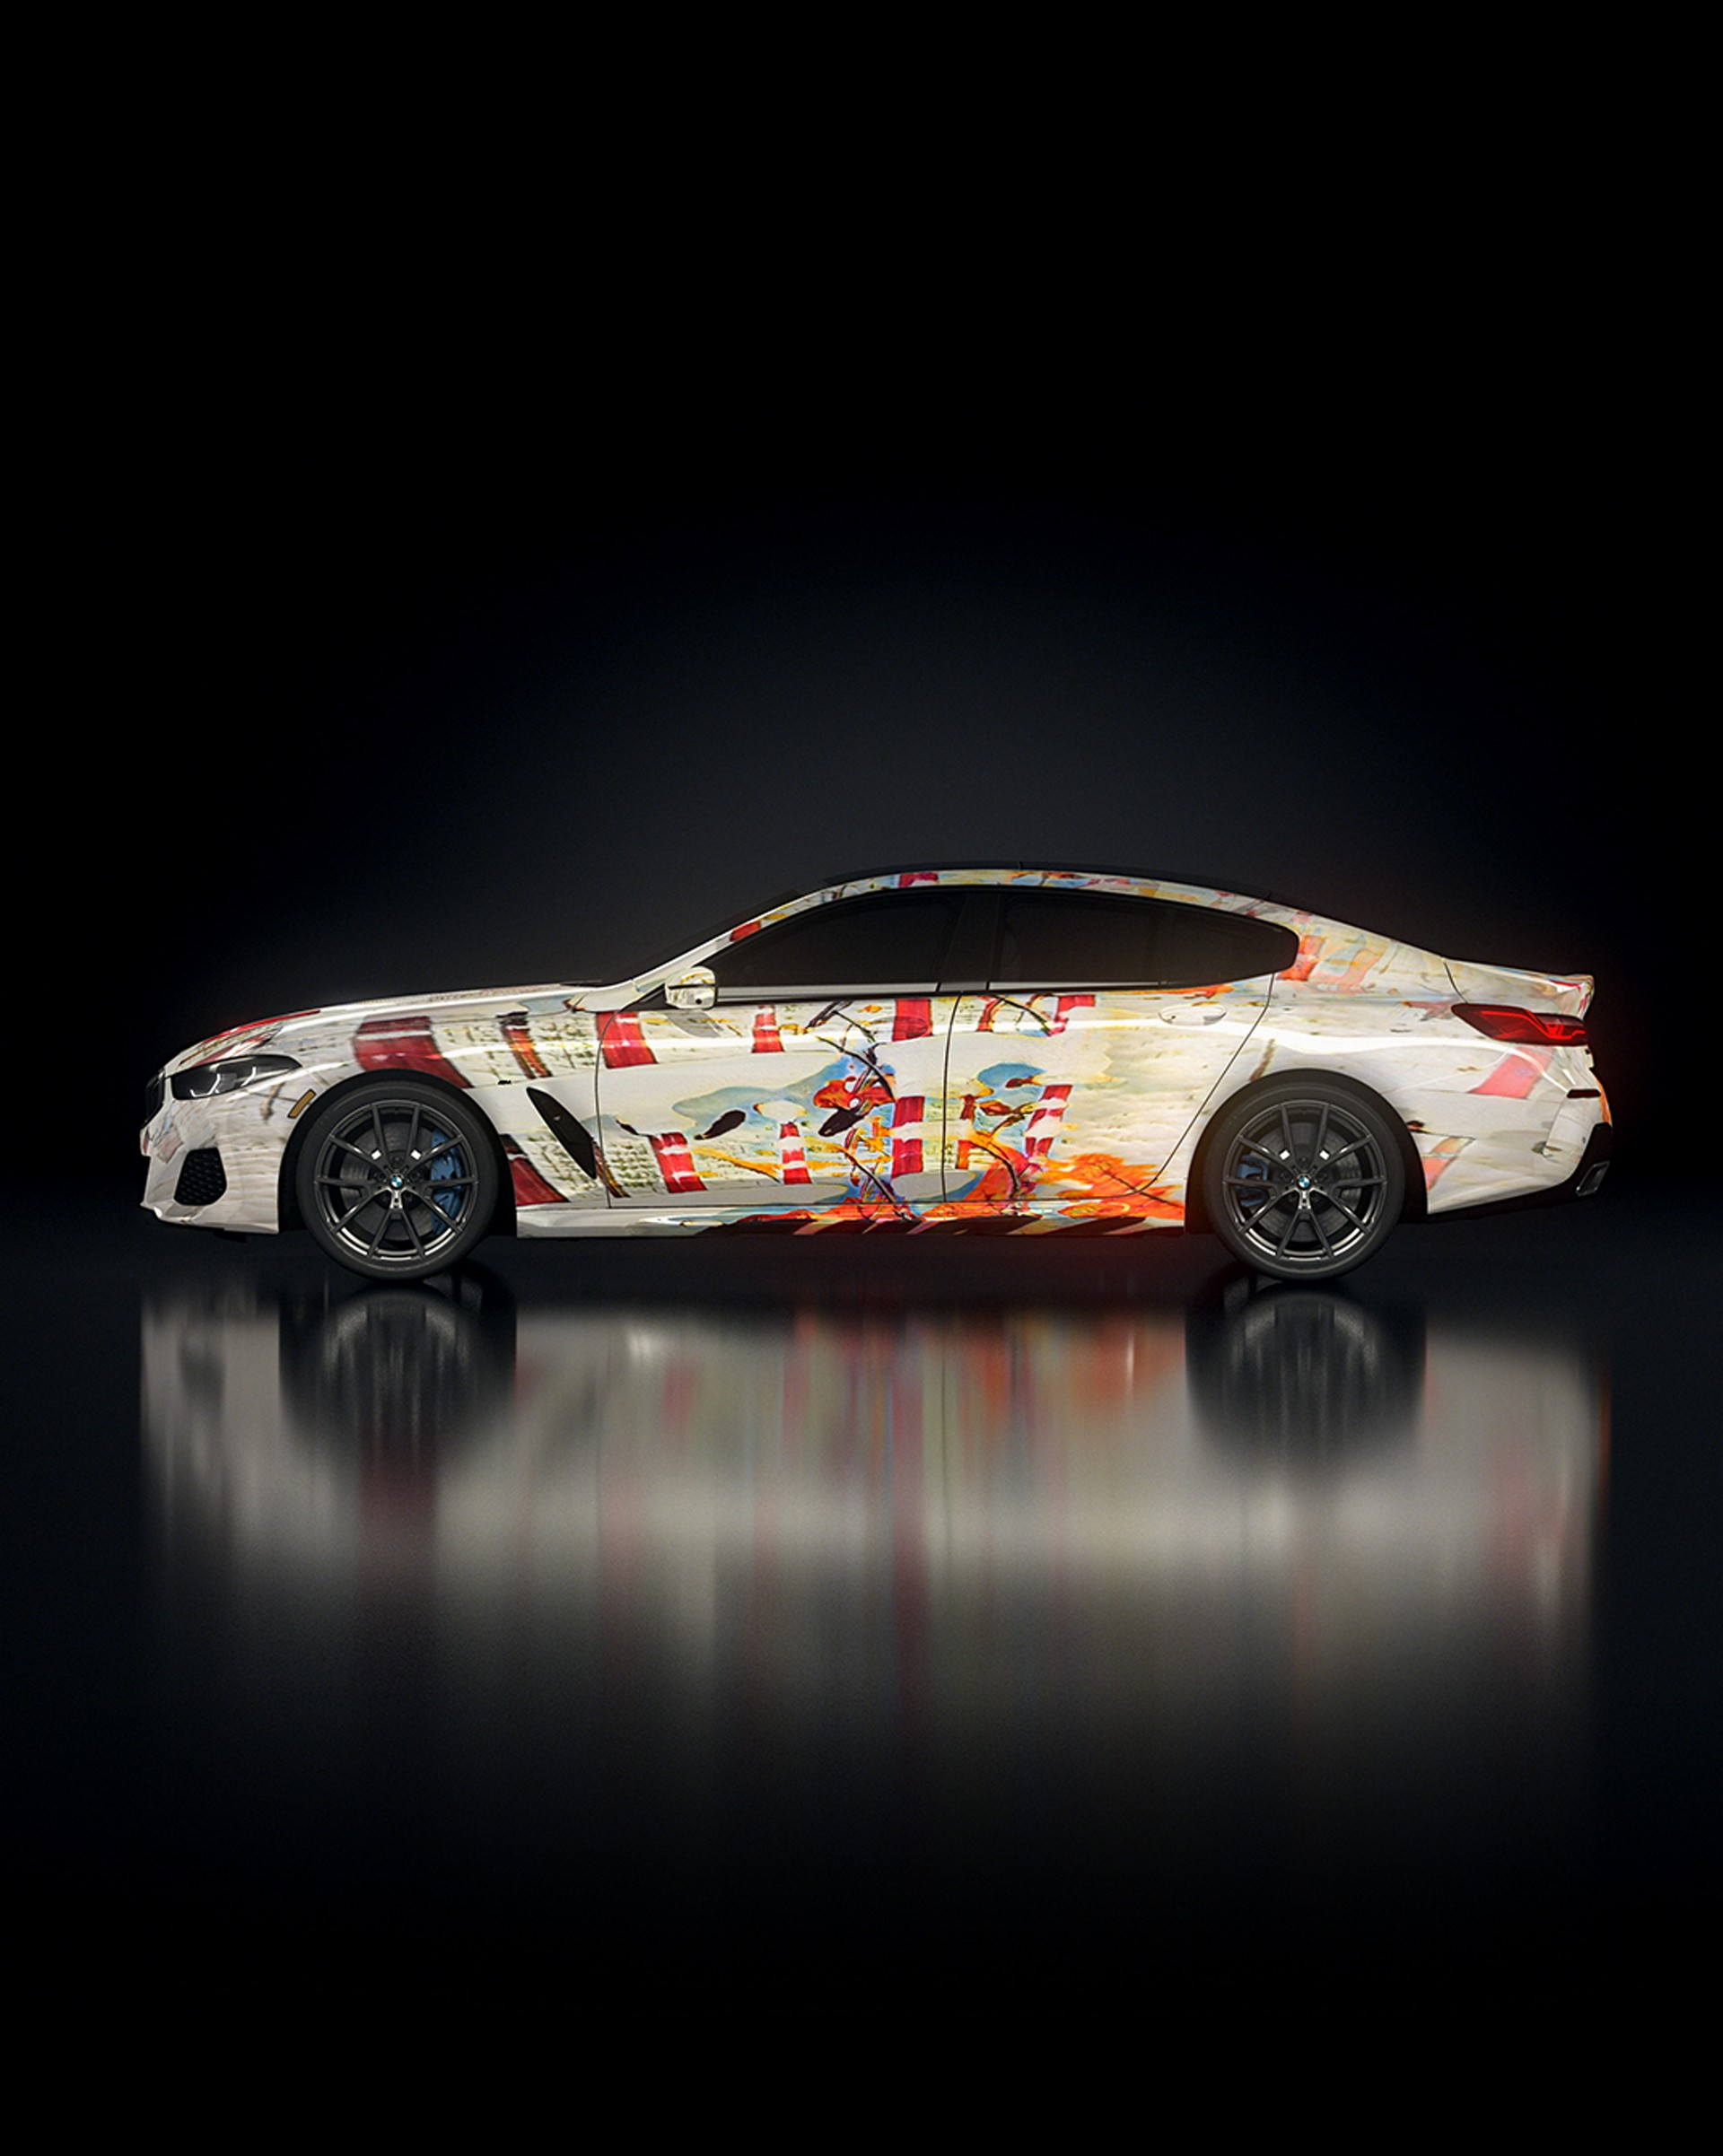 BMW-8-Series-Gran-Coupe-art-car-35